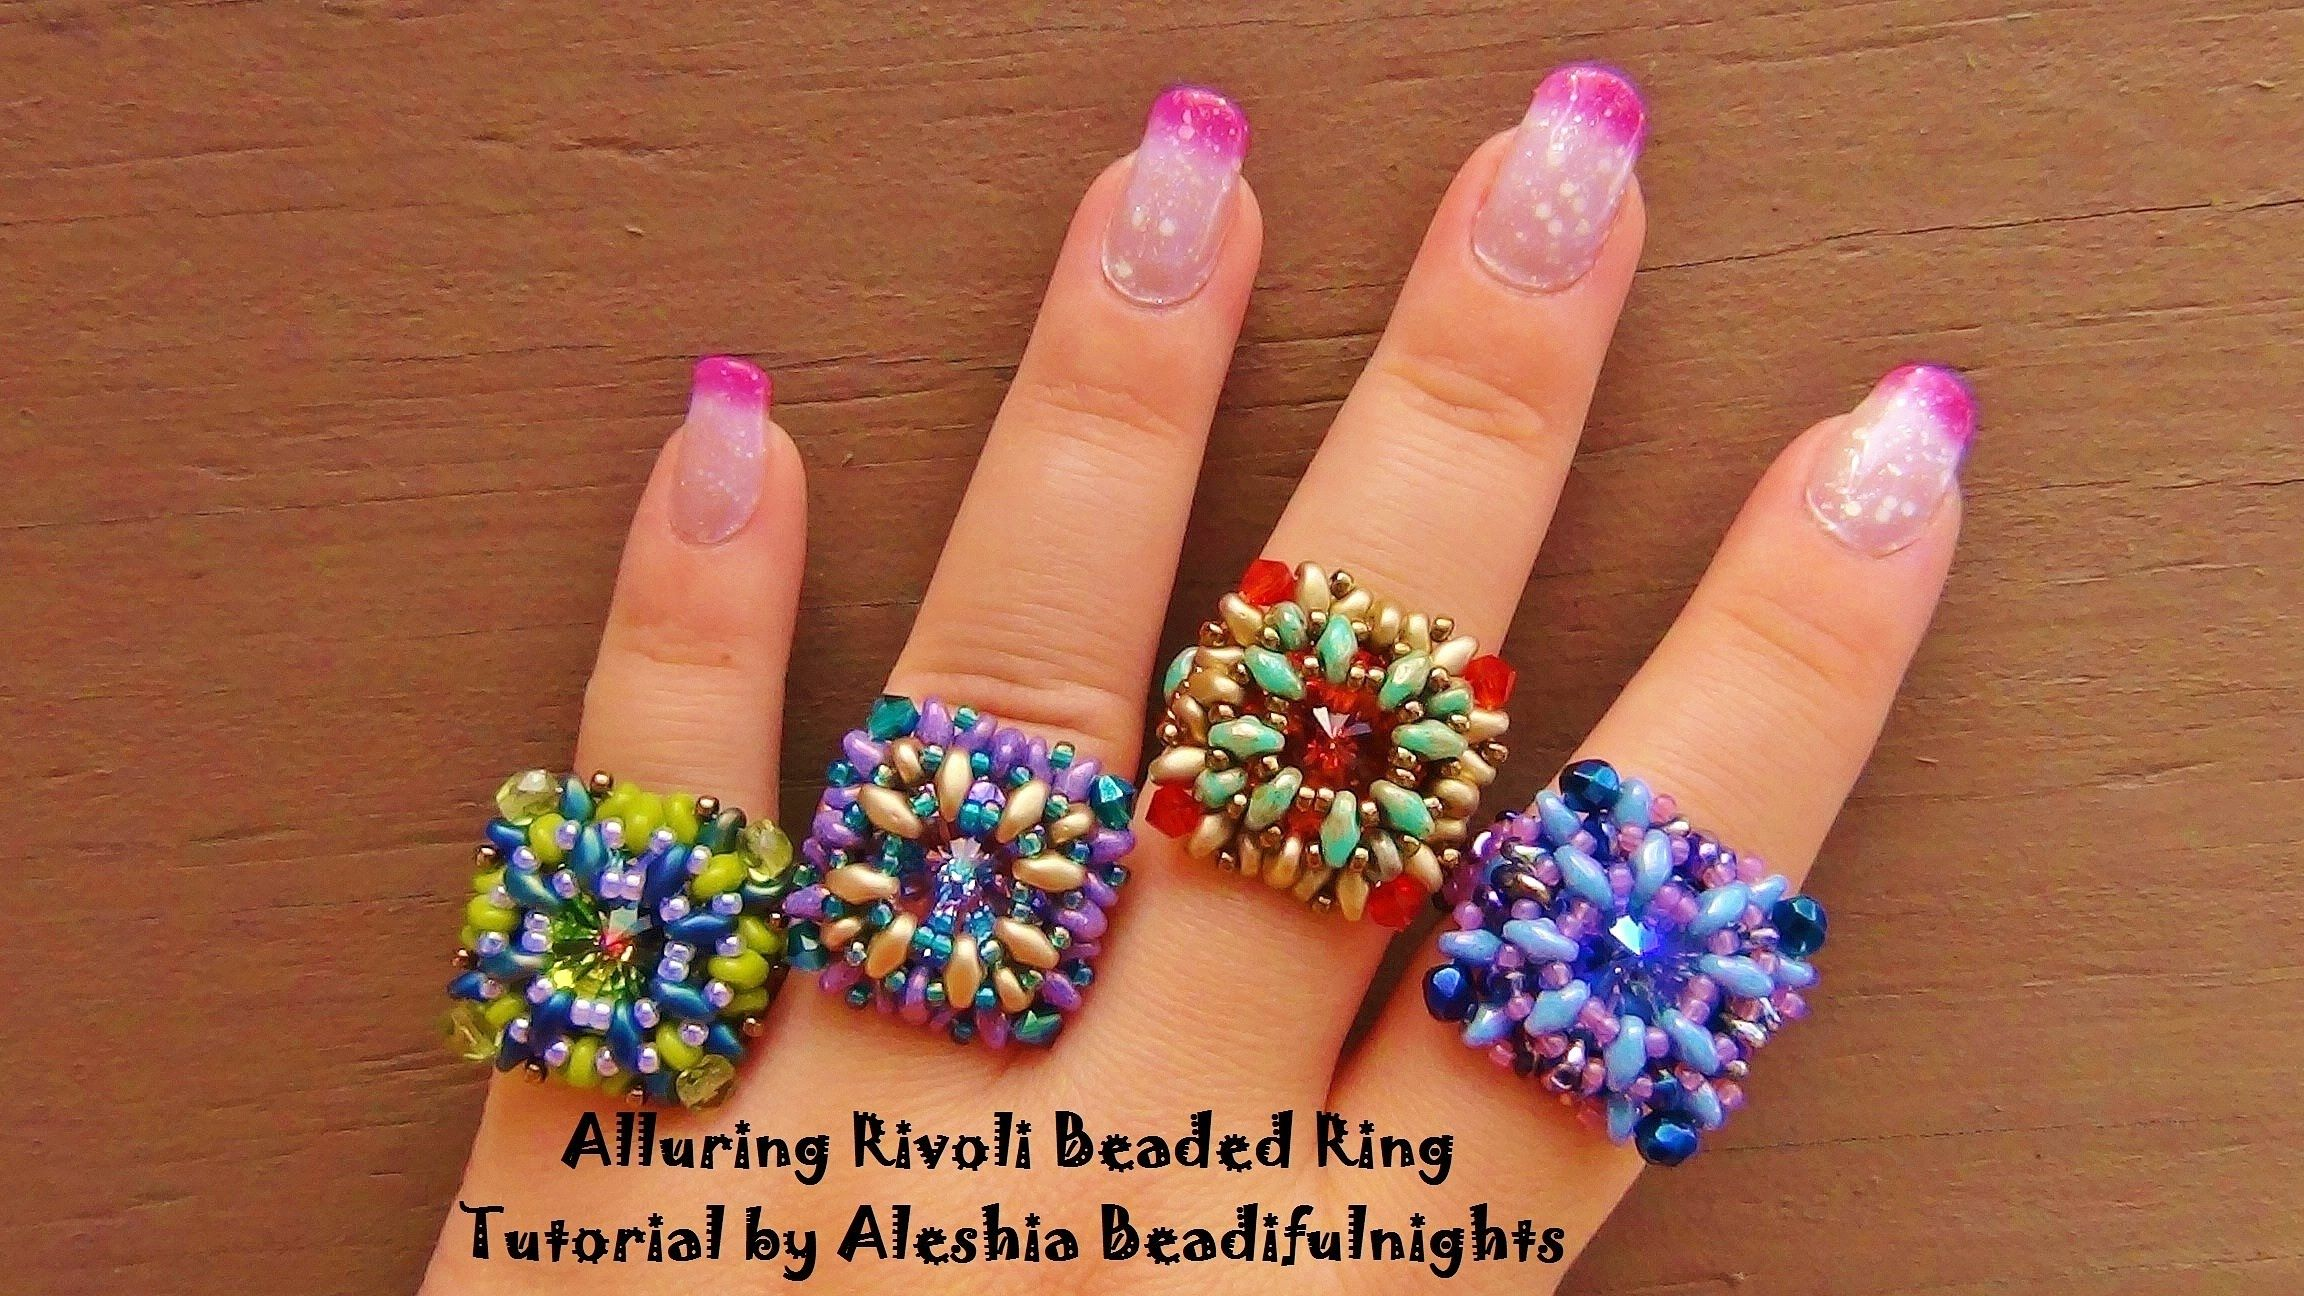 Alluring rivoli beaded ring seed bead tutorials seed bead alluring rivoli beaded ring seed bead tutorials baditri Choice Image